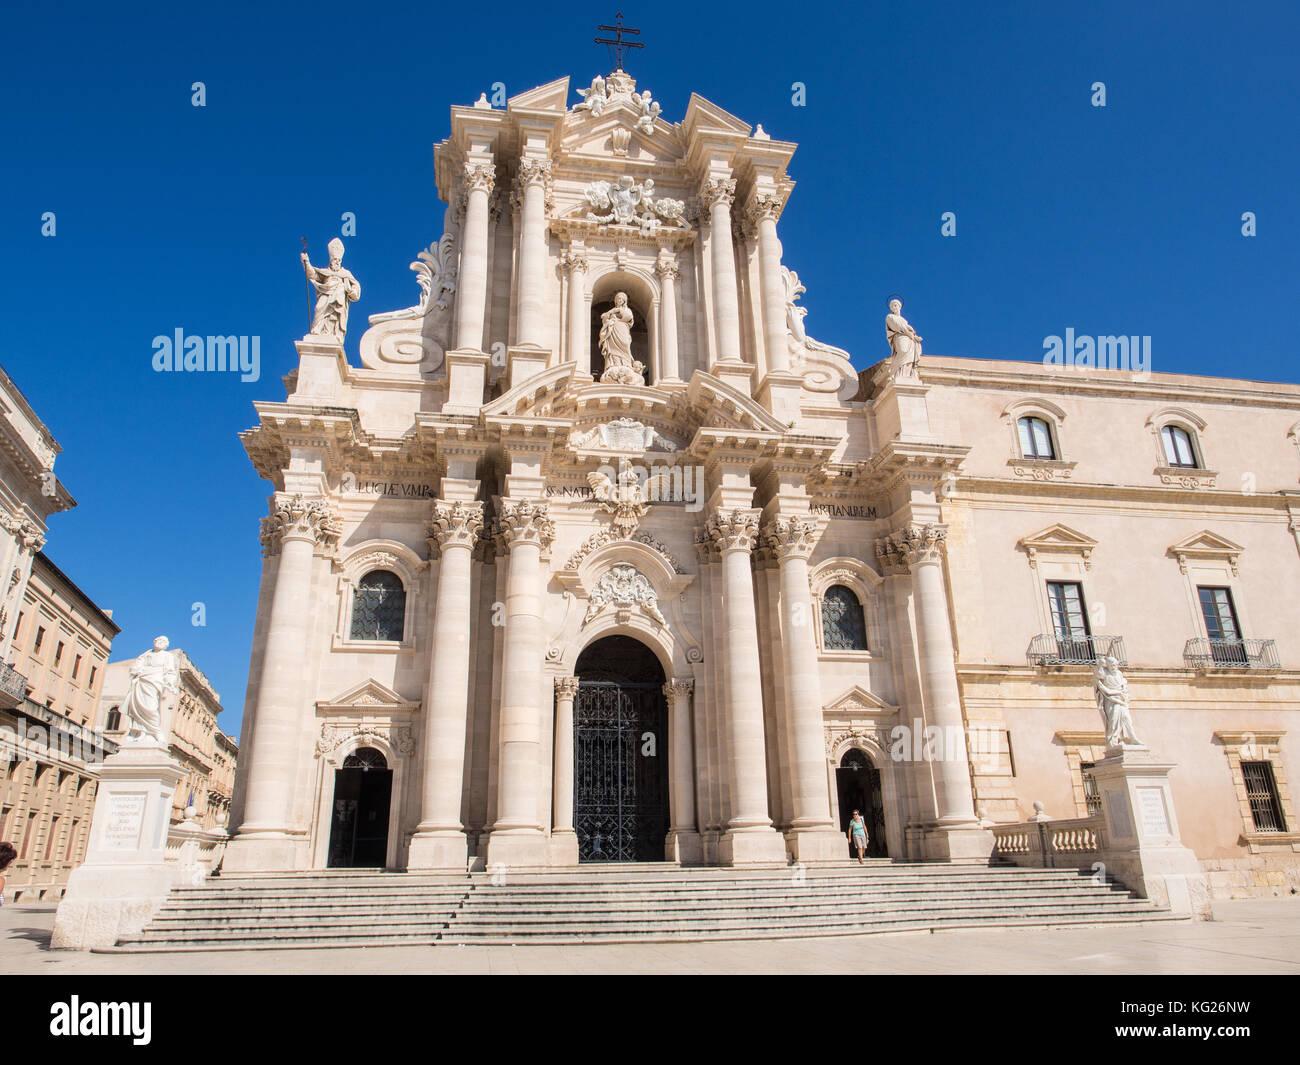 Die Kathedrale von Syrakus, der Insel Ortygia, UNESCO-Weltkulturerbe, Syrakus (Siracusa), Sizilien, Italien, Europa Stockbild